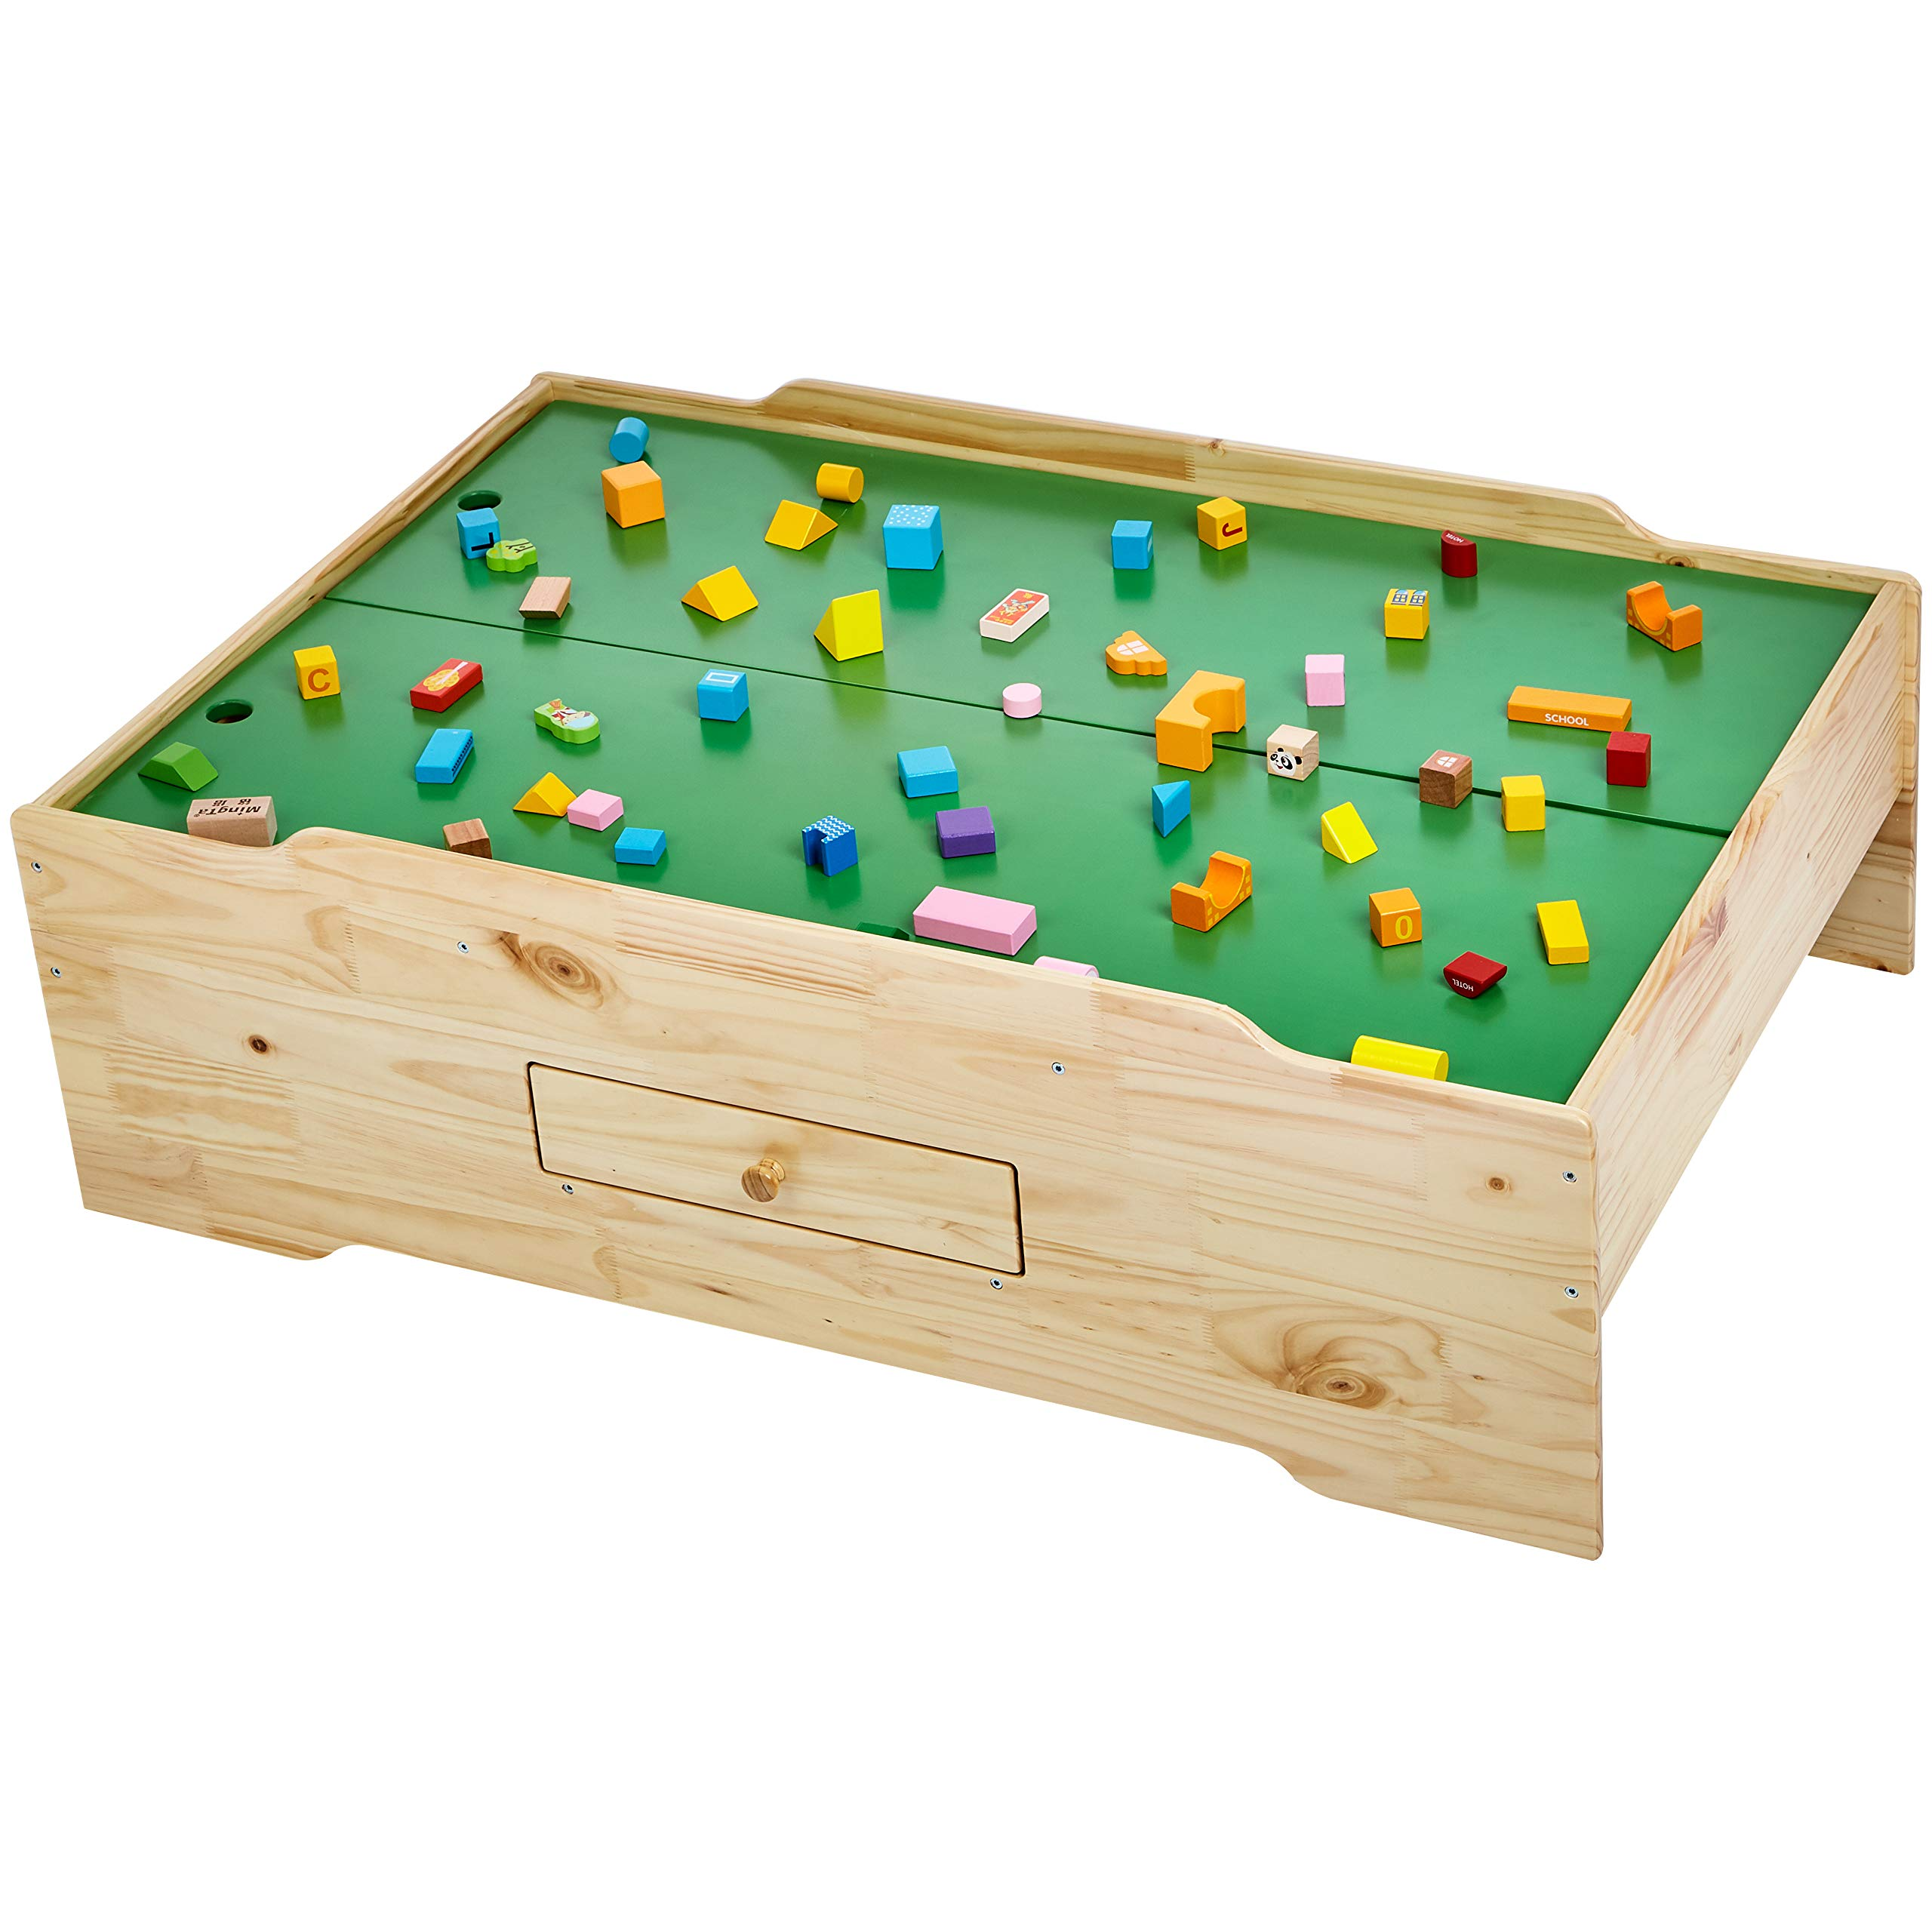 AmazonBasics Wooden Multi-Activity Play Table, Natural by AmazonBasics (Image #5)